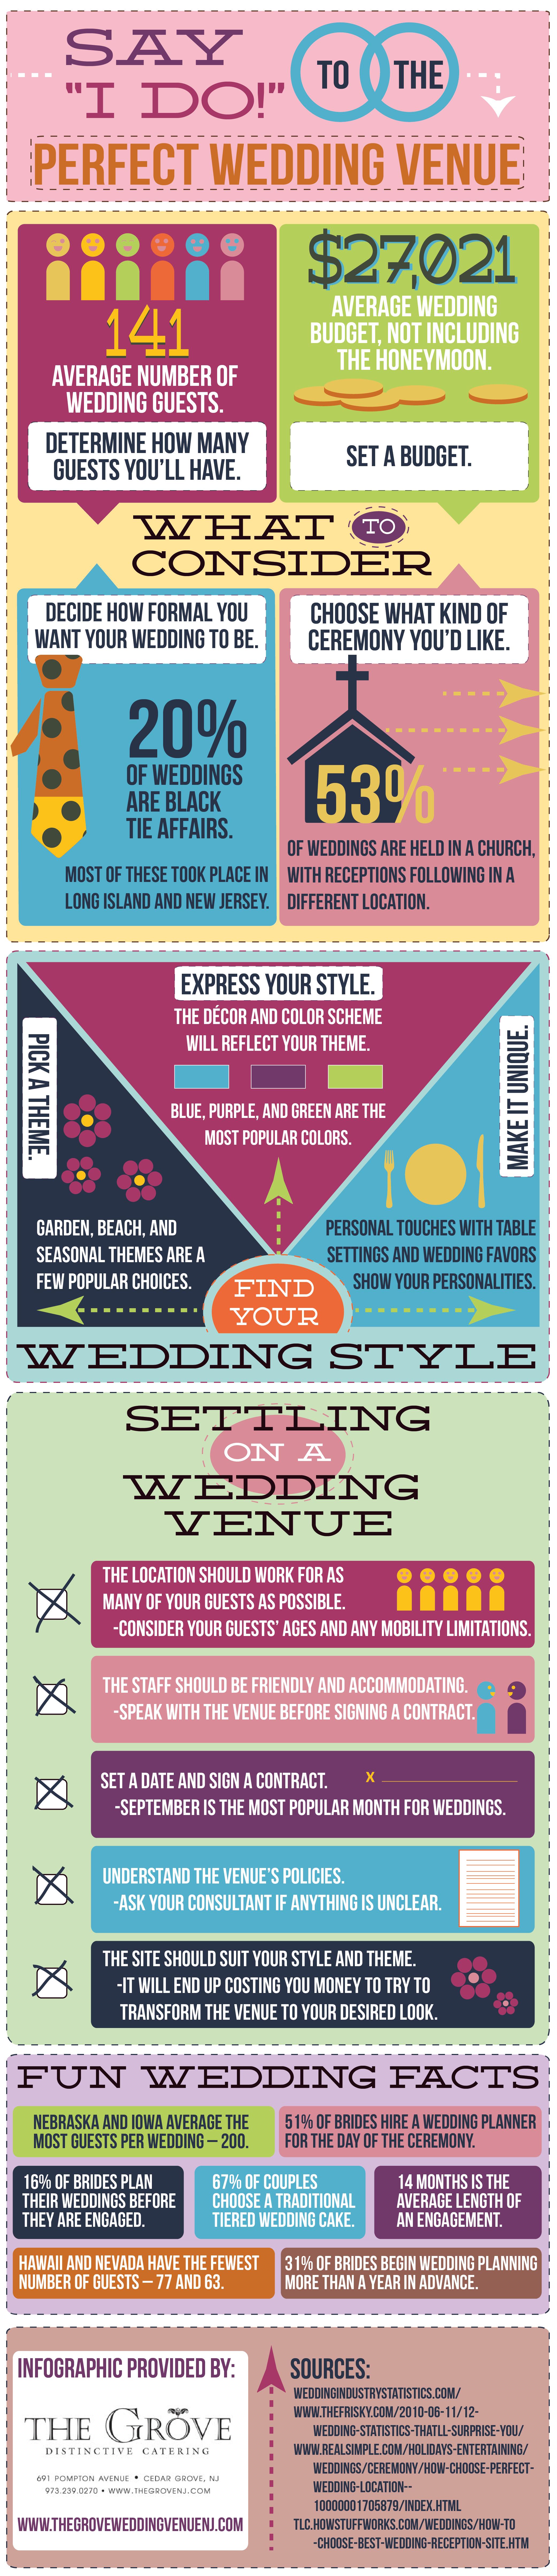 The Grove, wedding venue, New Jersey